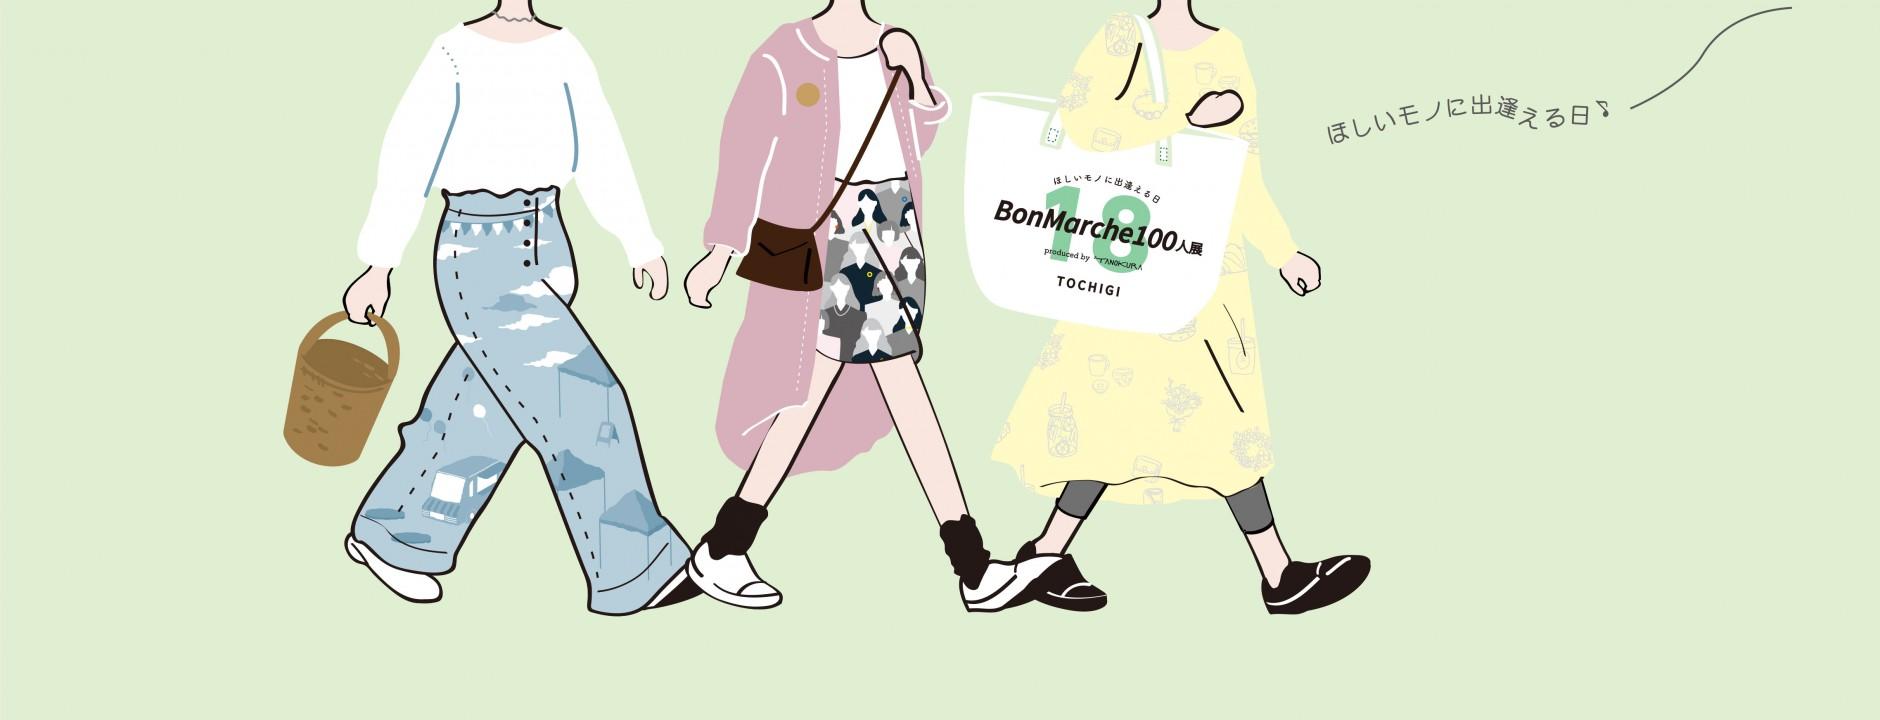 BonMarche100人展in栃木に遊びに行こう!